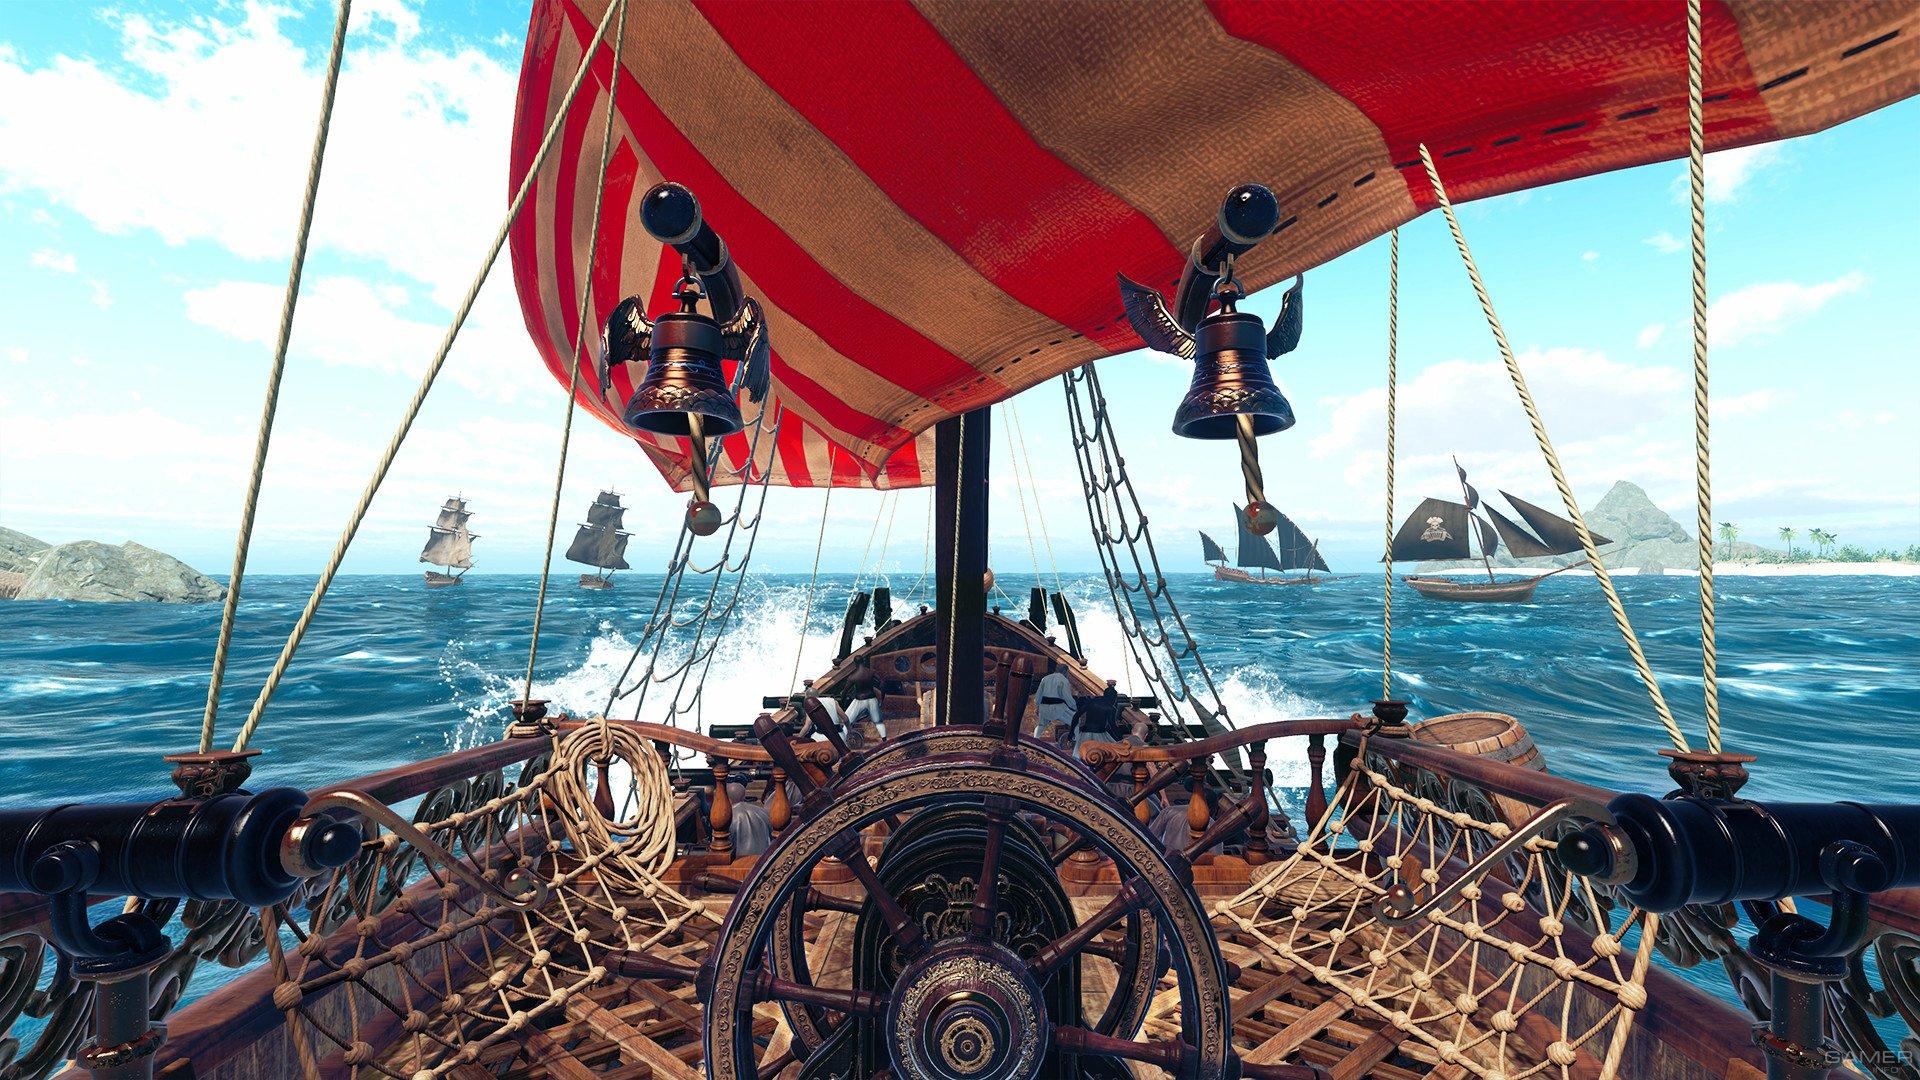 картинка палуба пиратского корабля турин часто